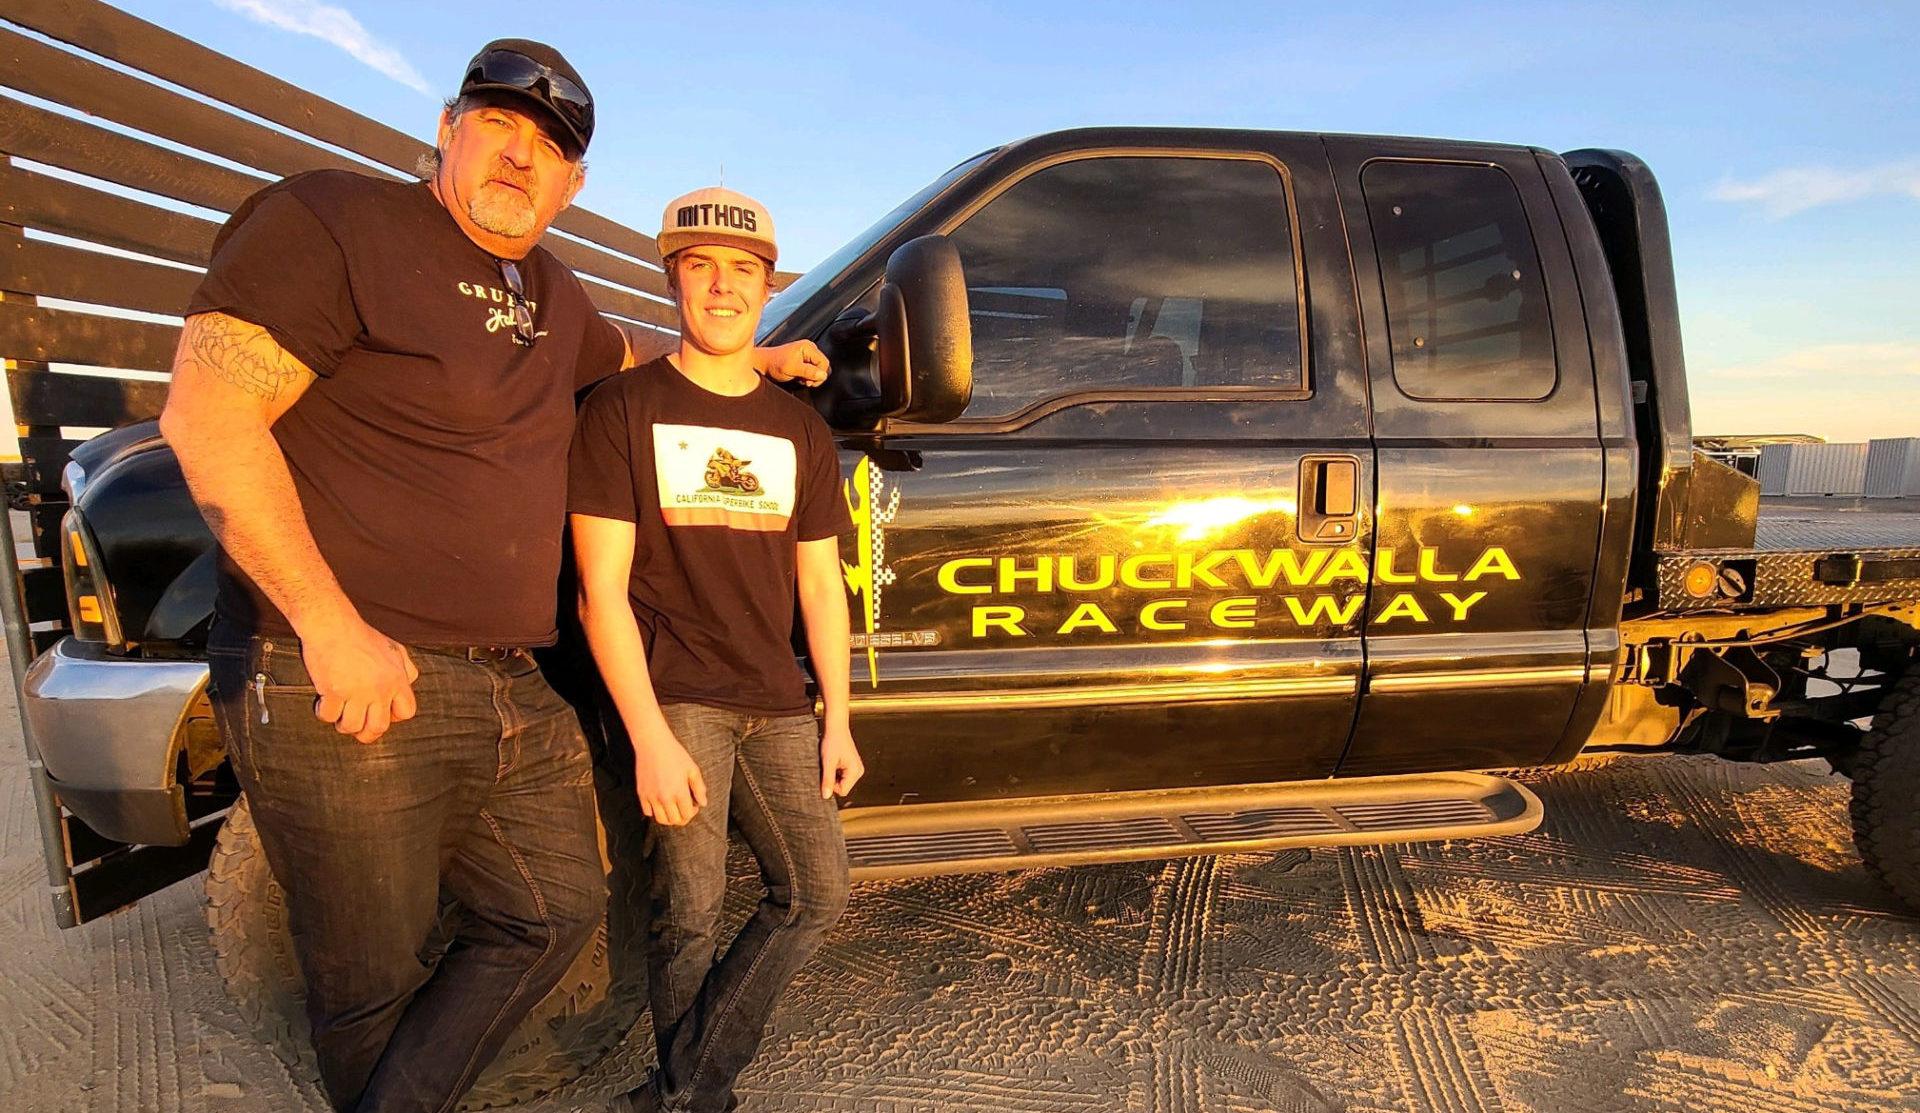 MotoAmerica Supersport racer Rocco Landers (right) with Chuckwalla Valley Raceway President Micky Grana (left). Photo courtesy Landers Racing.